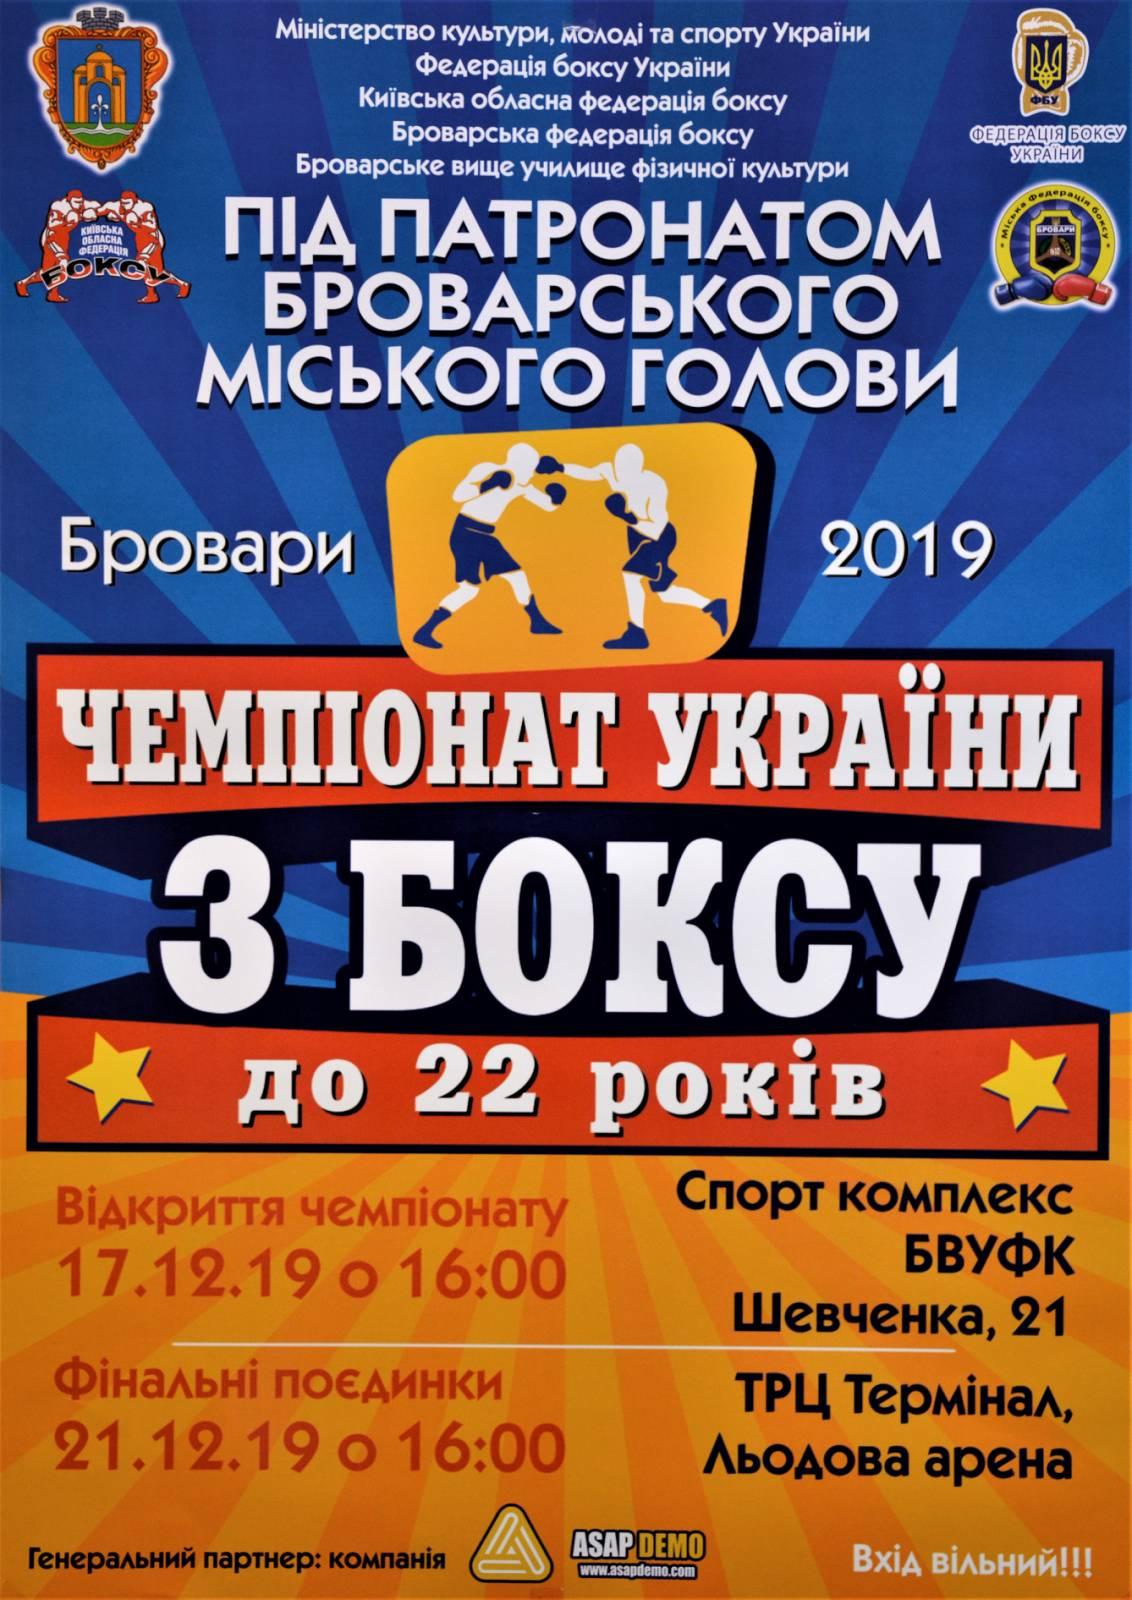 yzobrazhenye_viber_2019-12-11_13-52-41 Чемпіонат України з боксу в Броварах